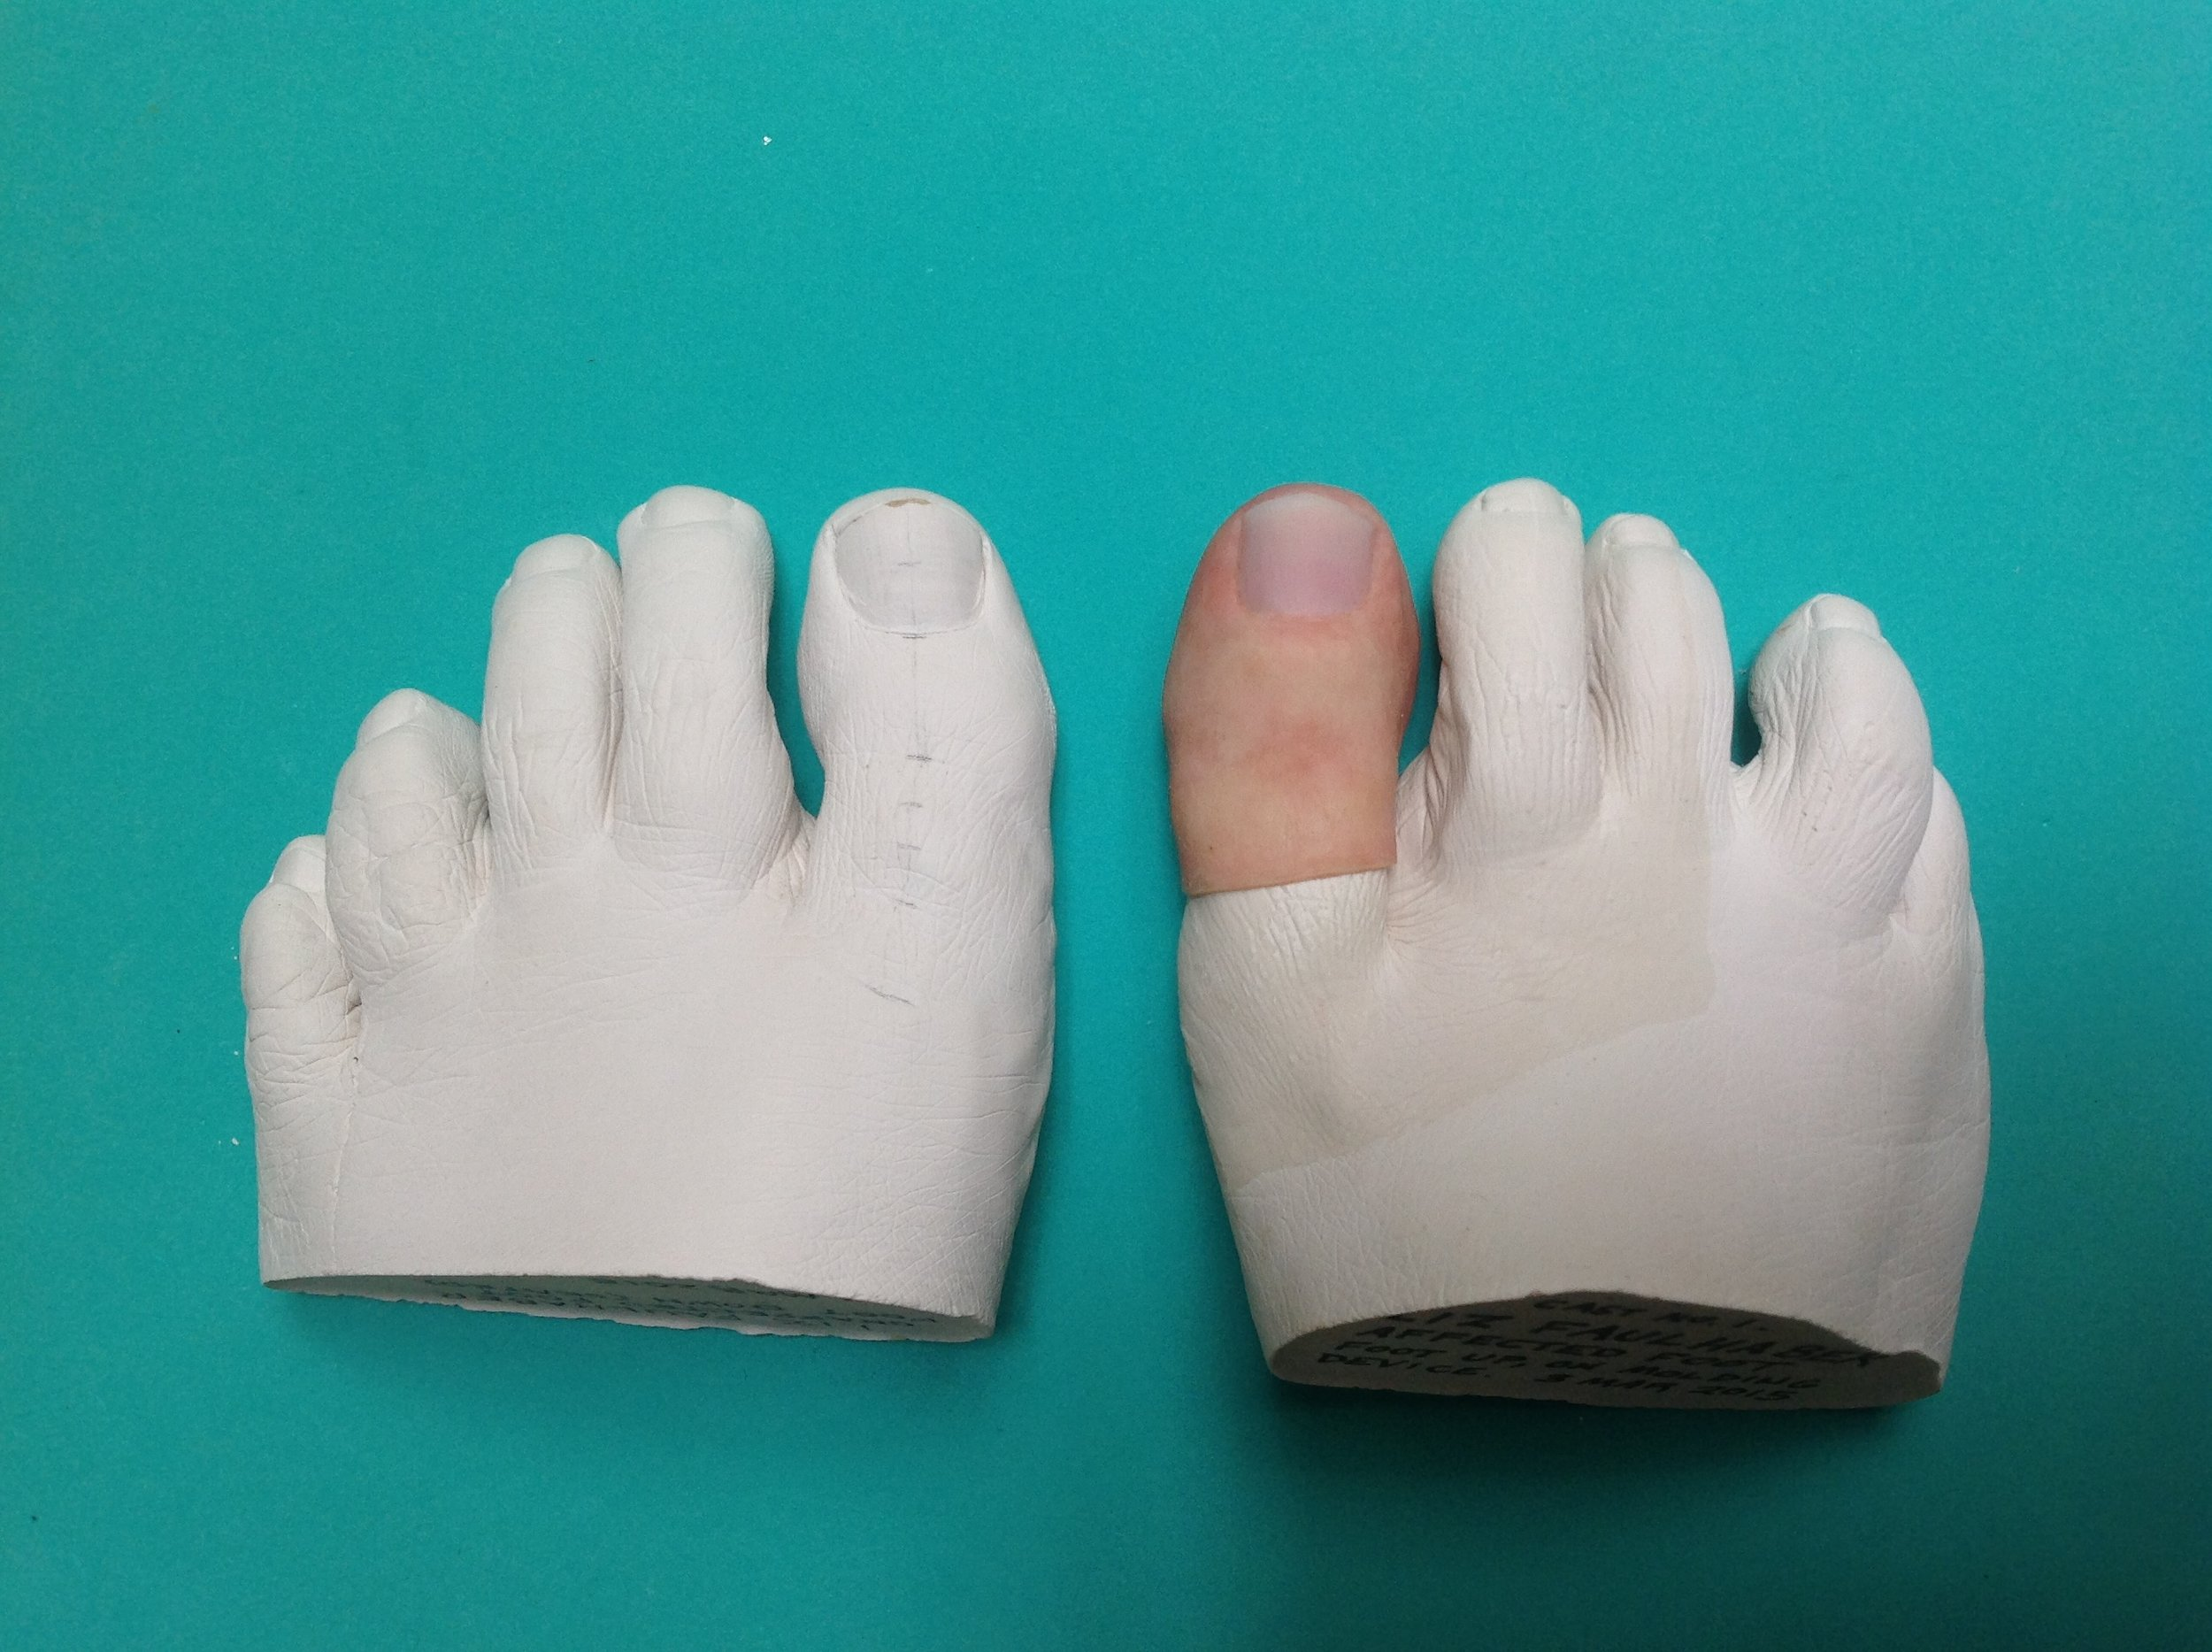 Big Toe Prosthesis